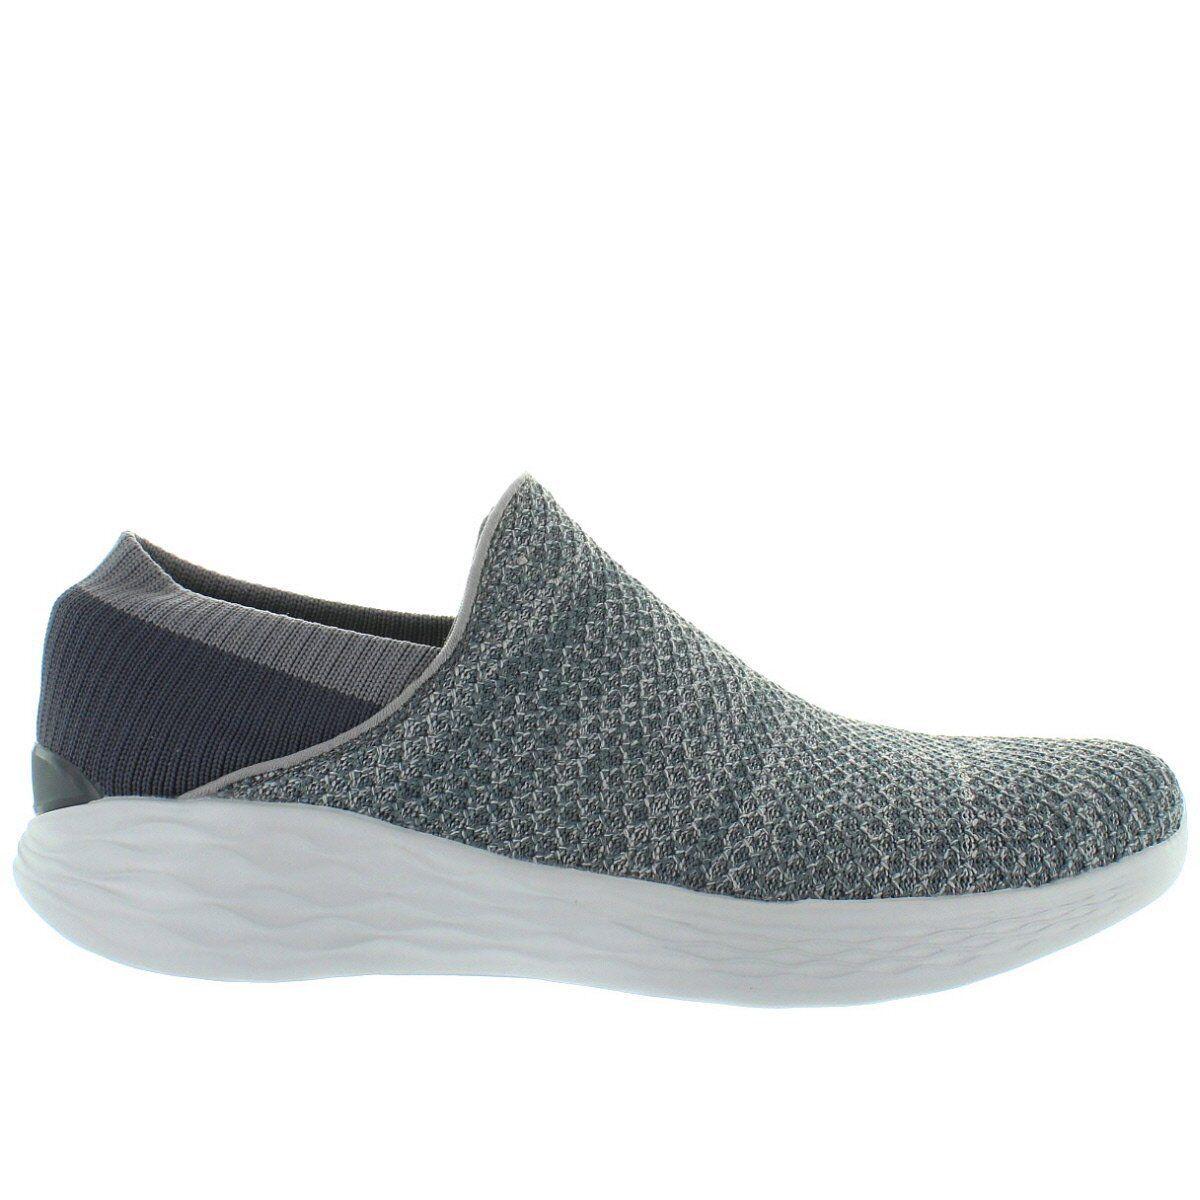 Skechers You Walk - You Slip Charcoal Mesh Slip-On Sneaker